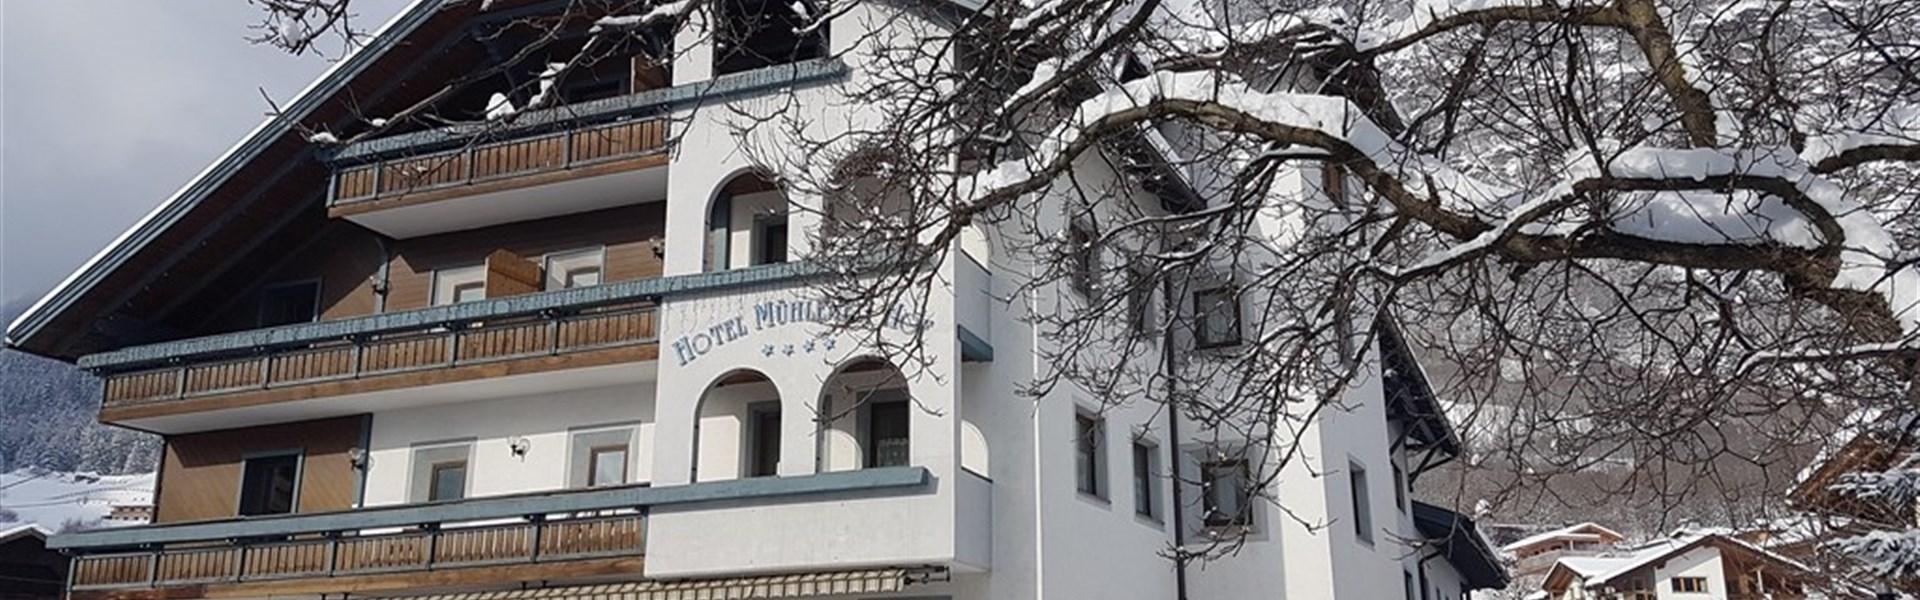 Marco Polo - Active Mountain Hotel Mühlenerhof -